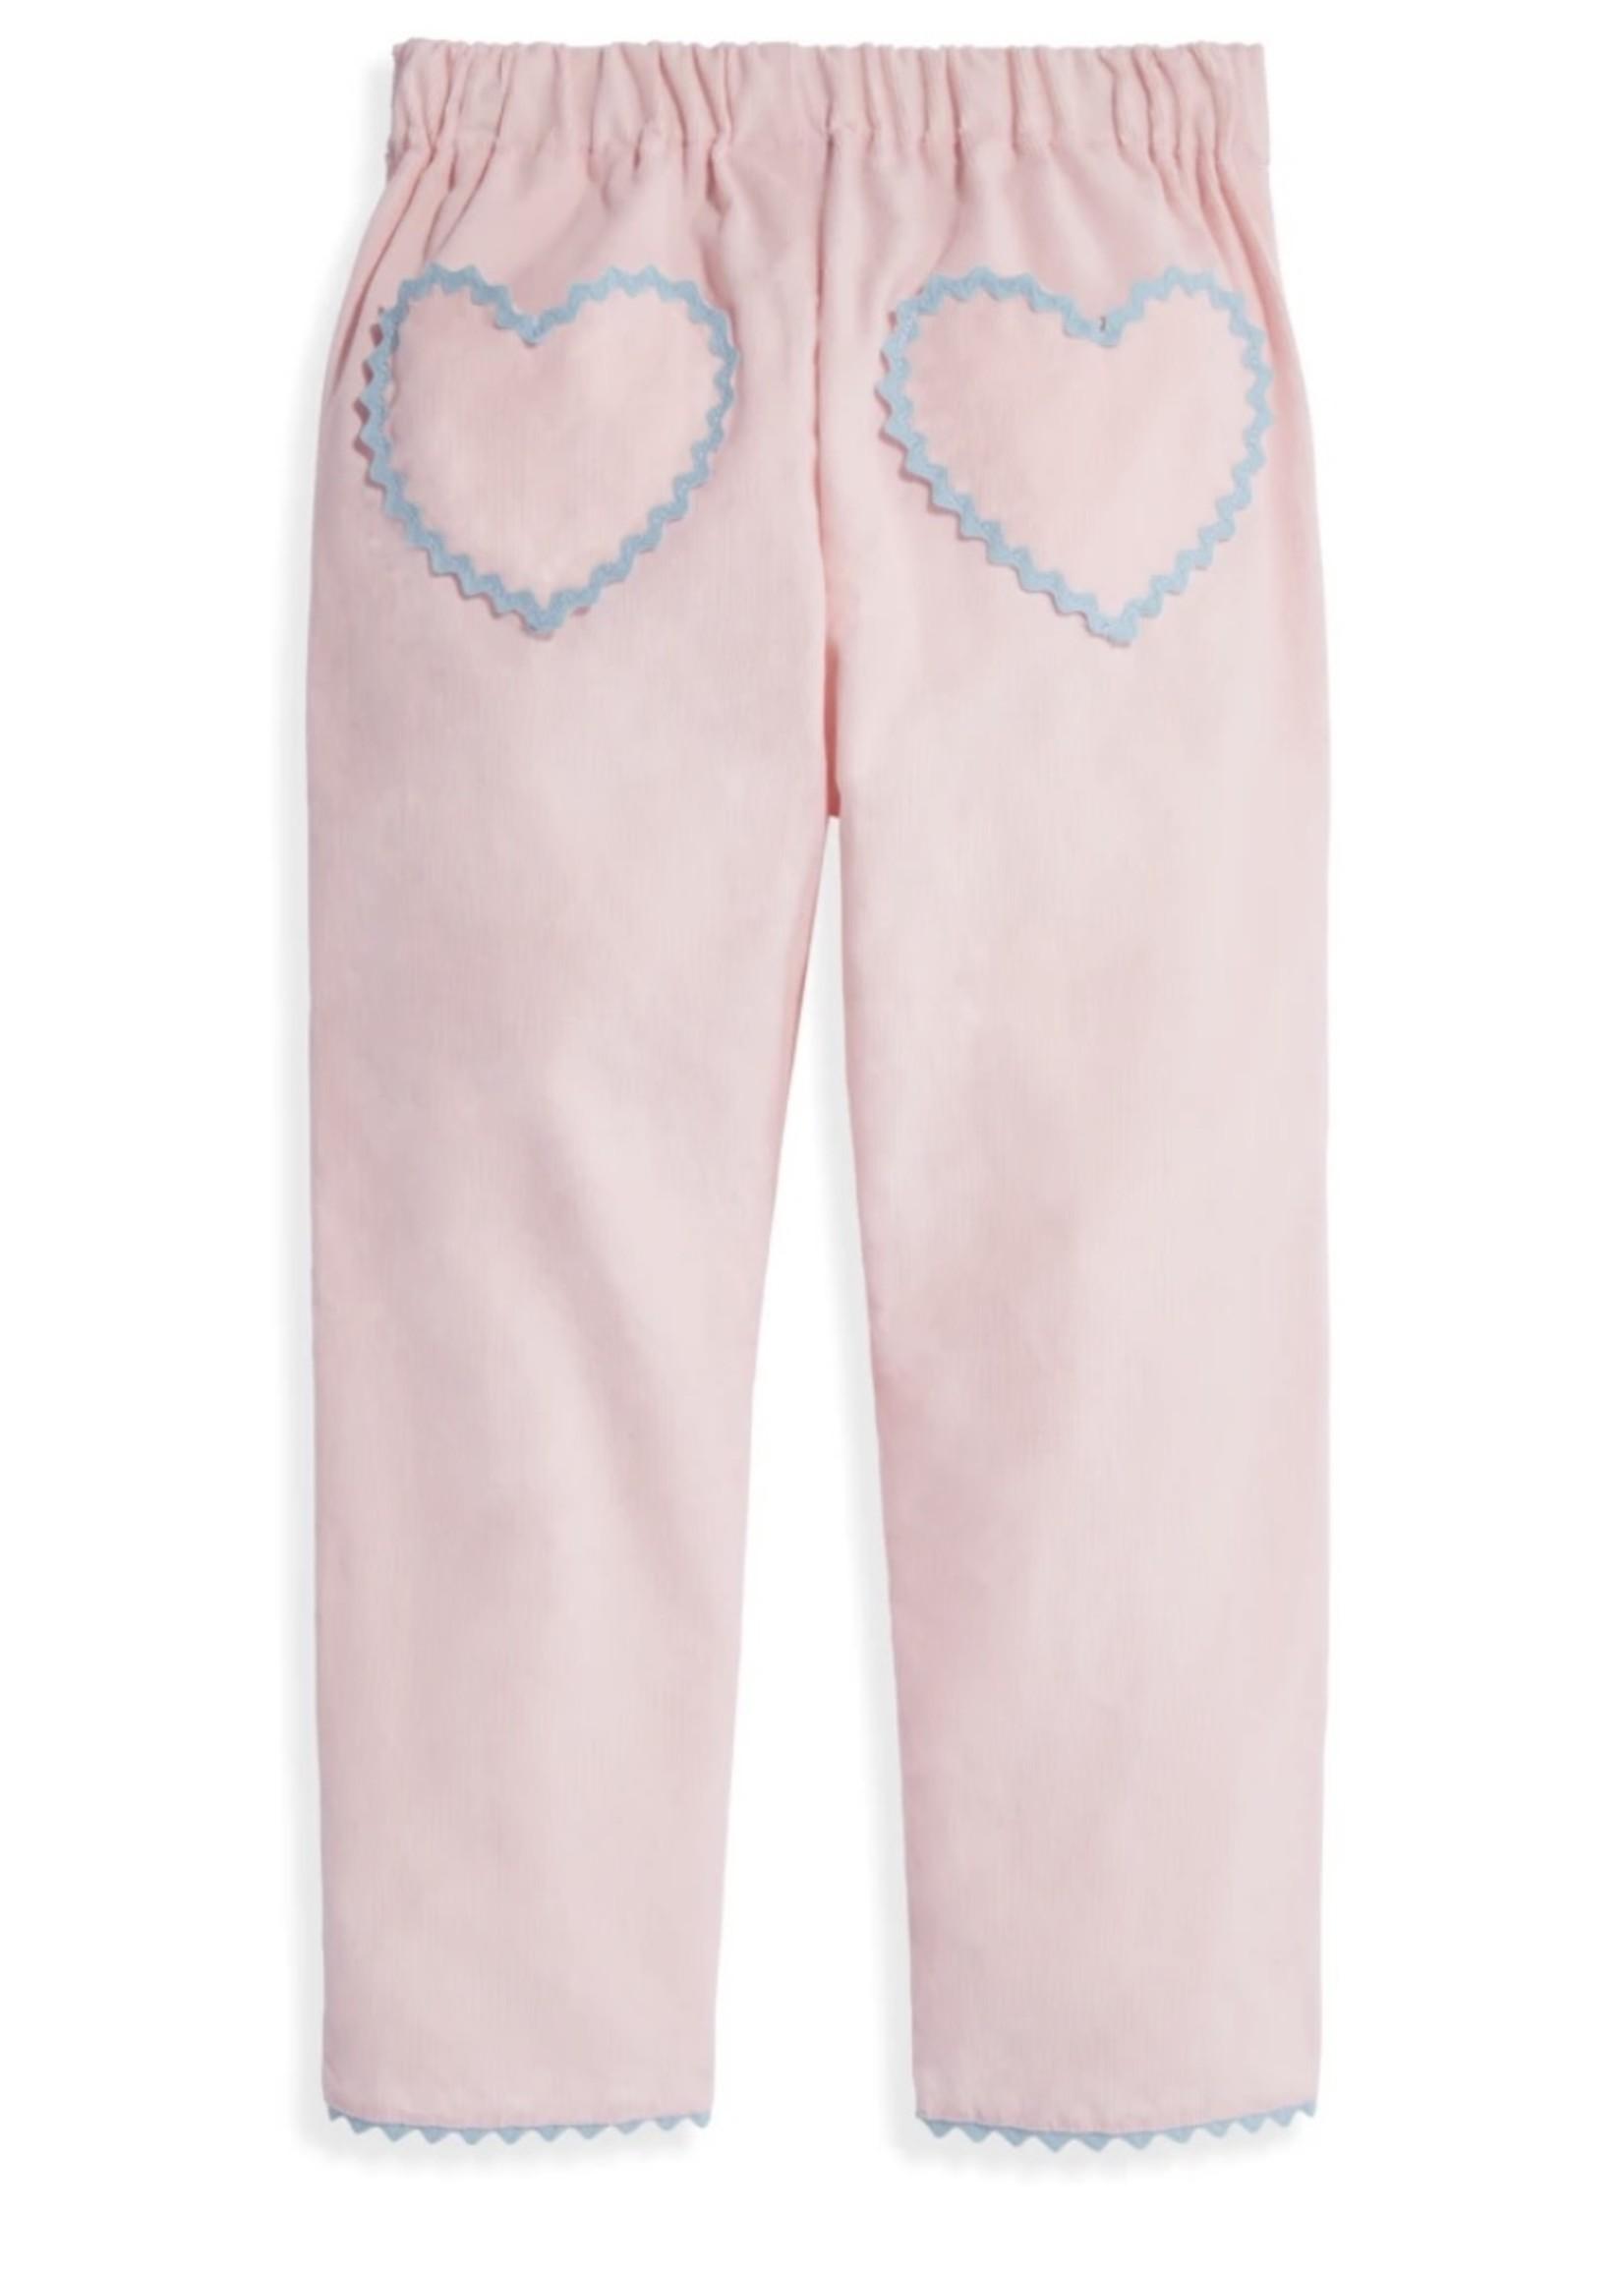 Heart Pocket Lulu Pant - Blush Cord